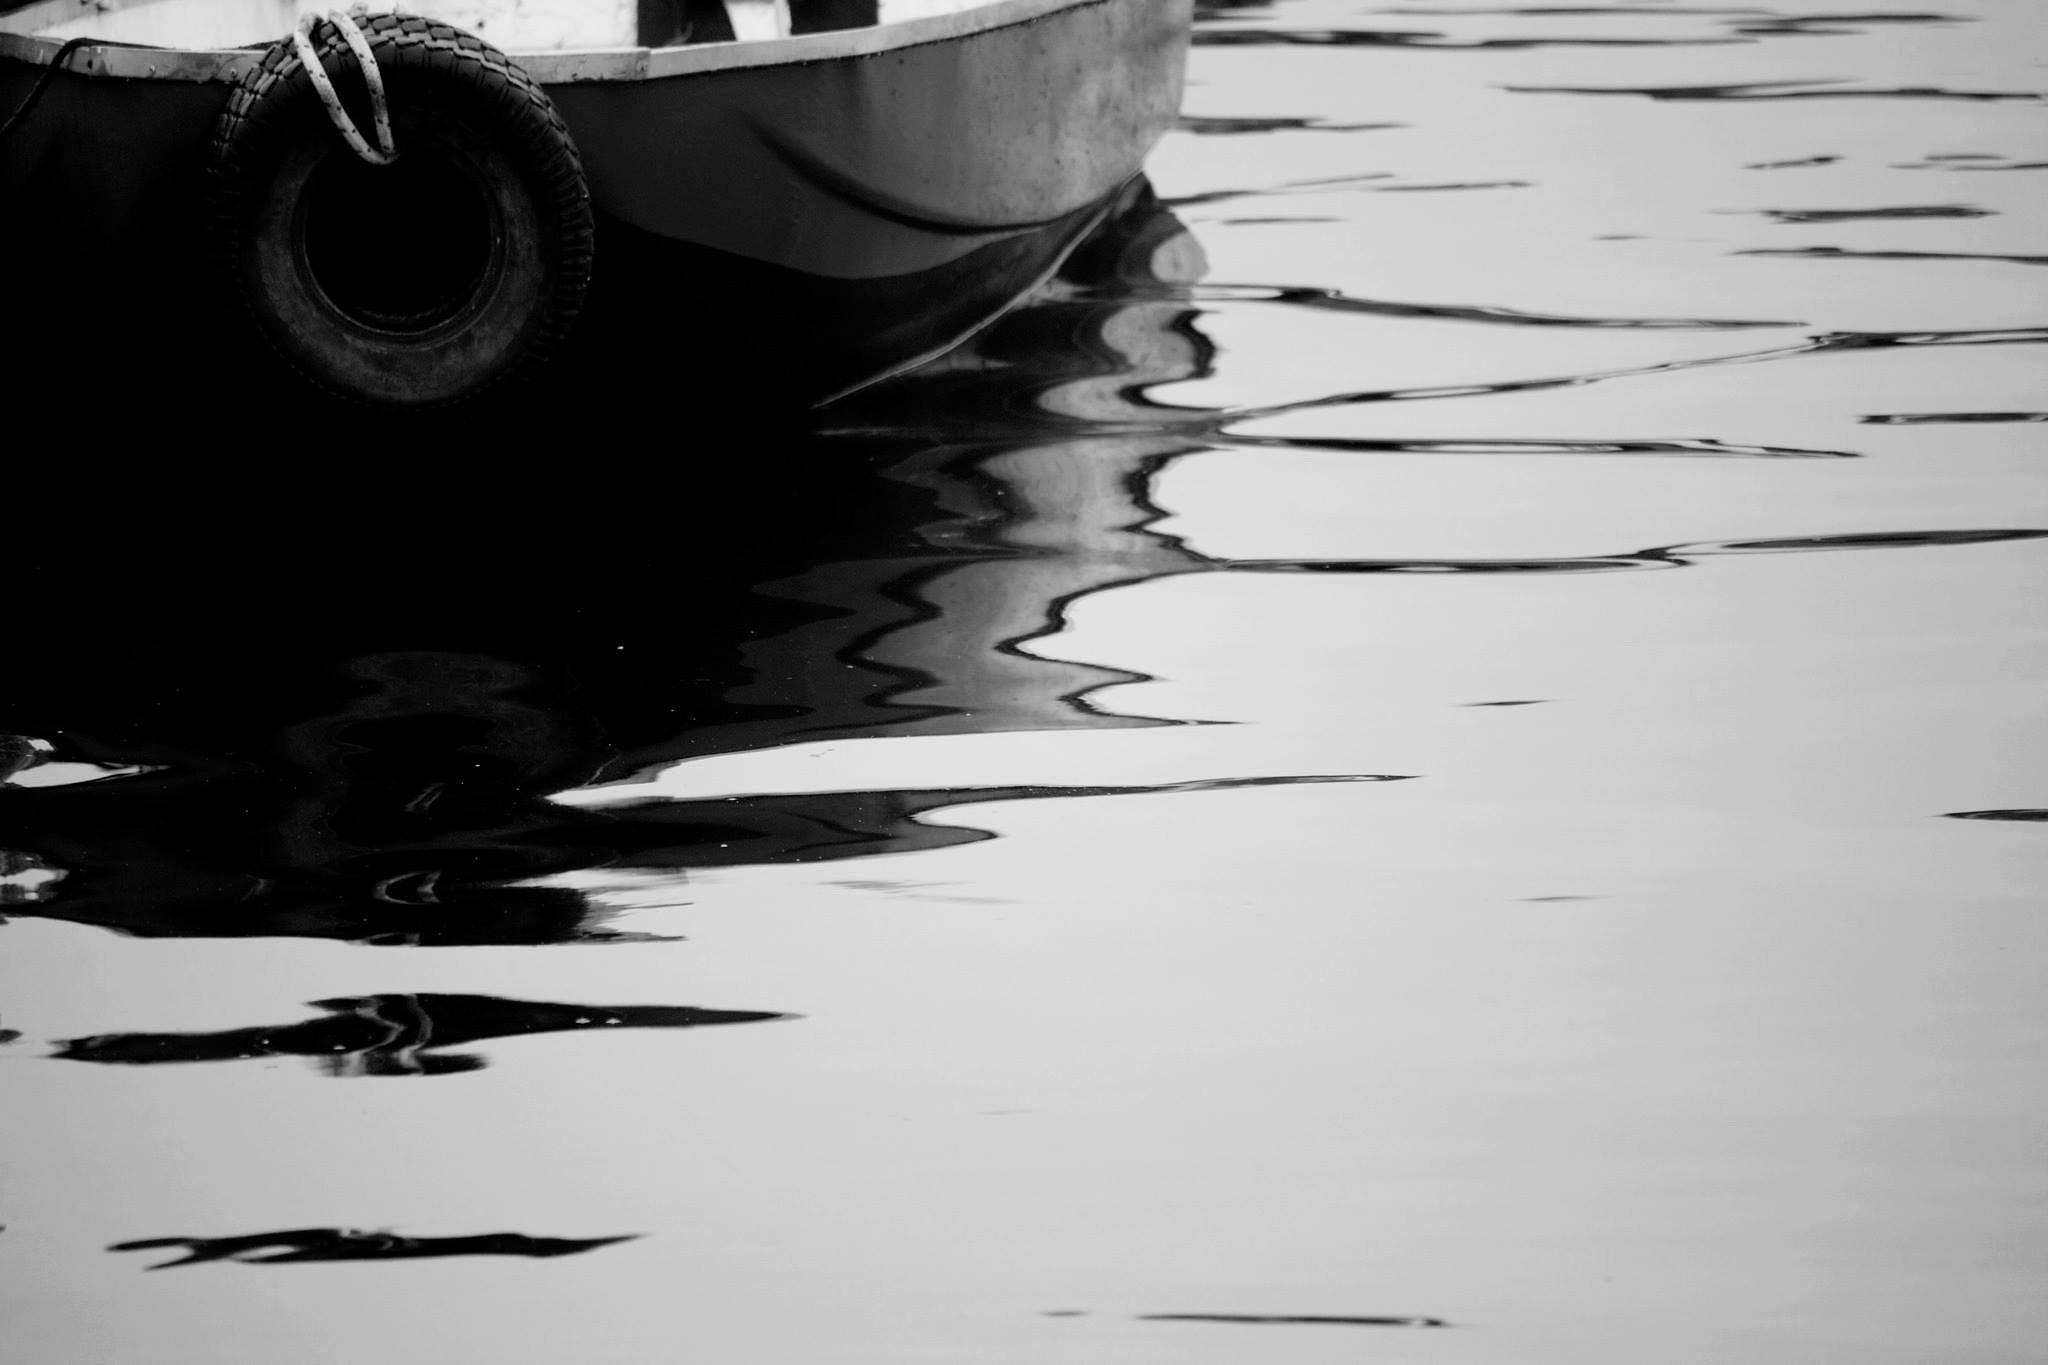 Untitled by kim.trevors